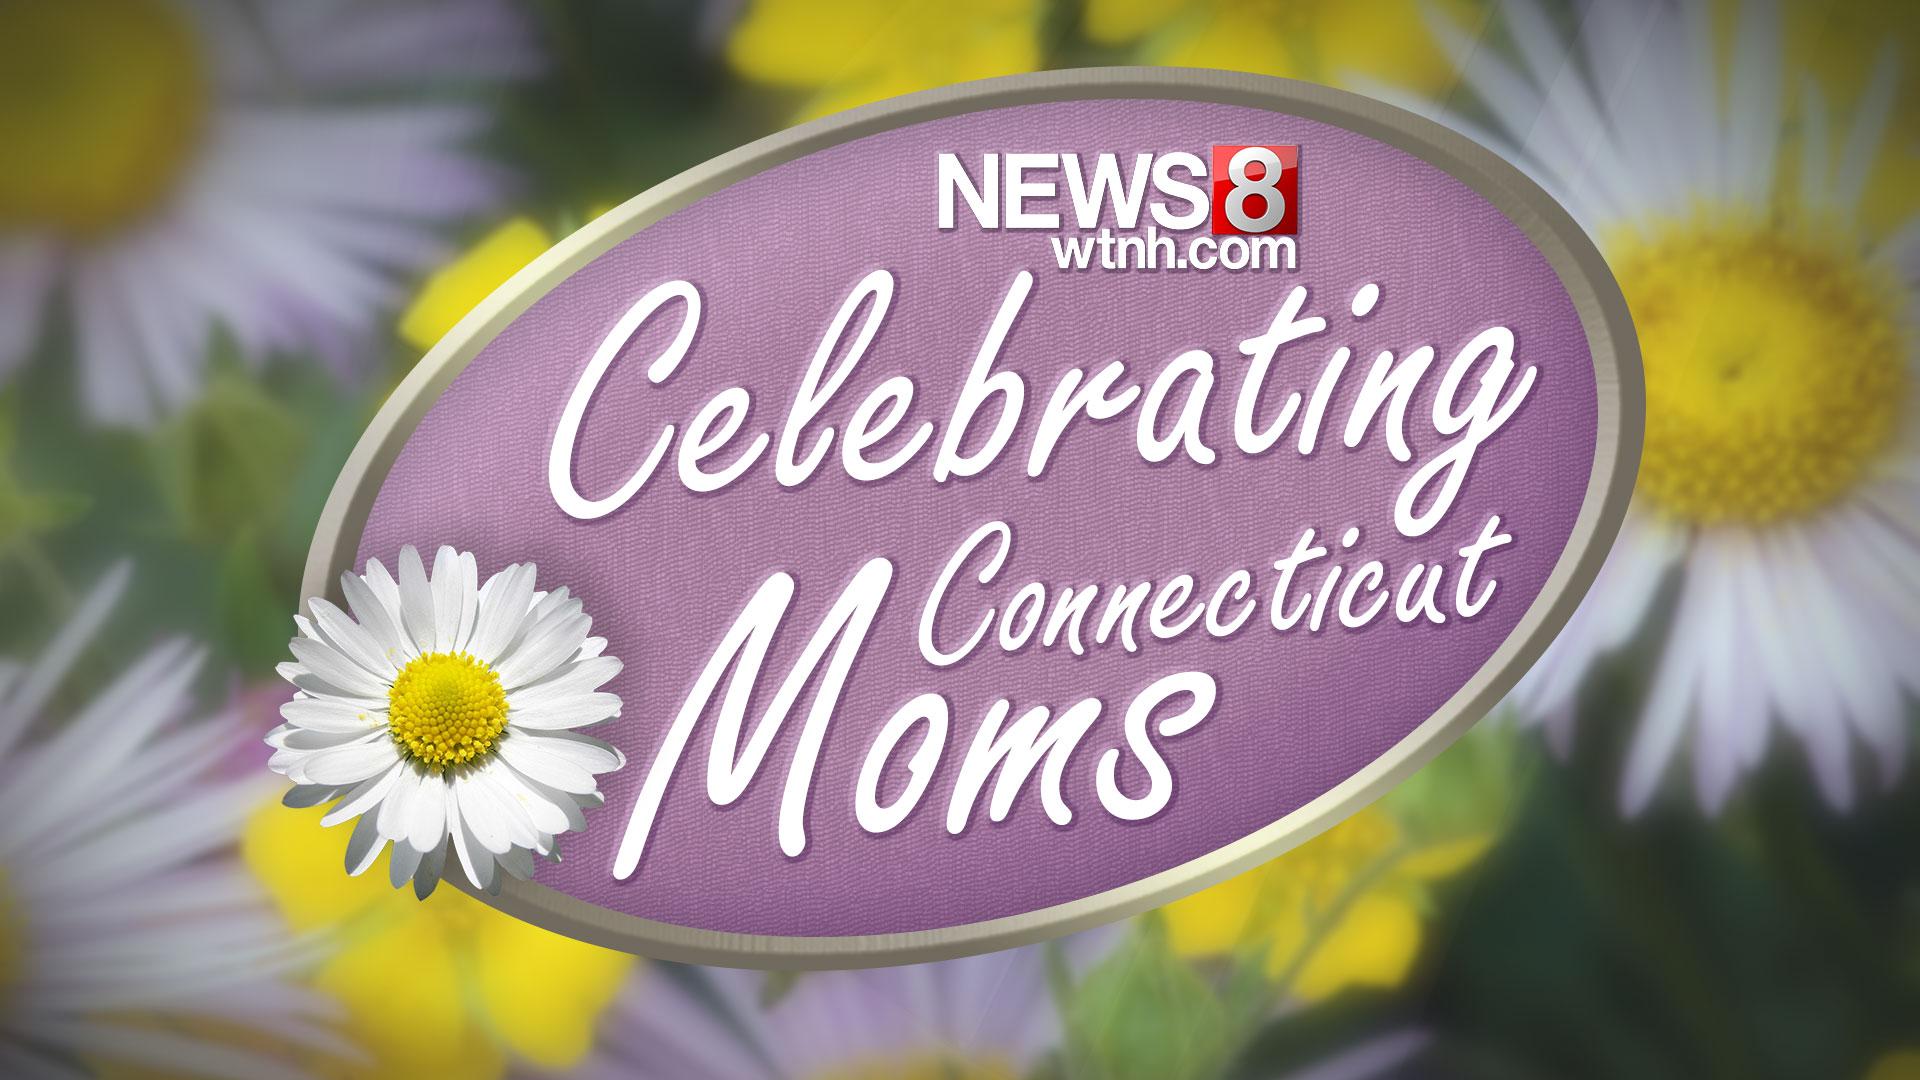 celebrating-ct-moms_1555704472111.jpg